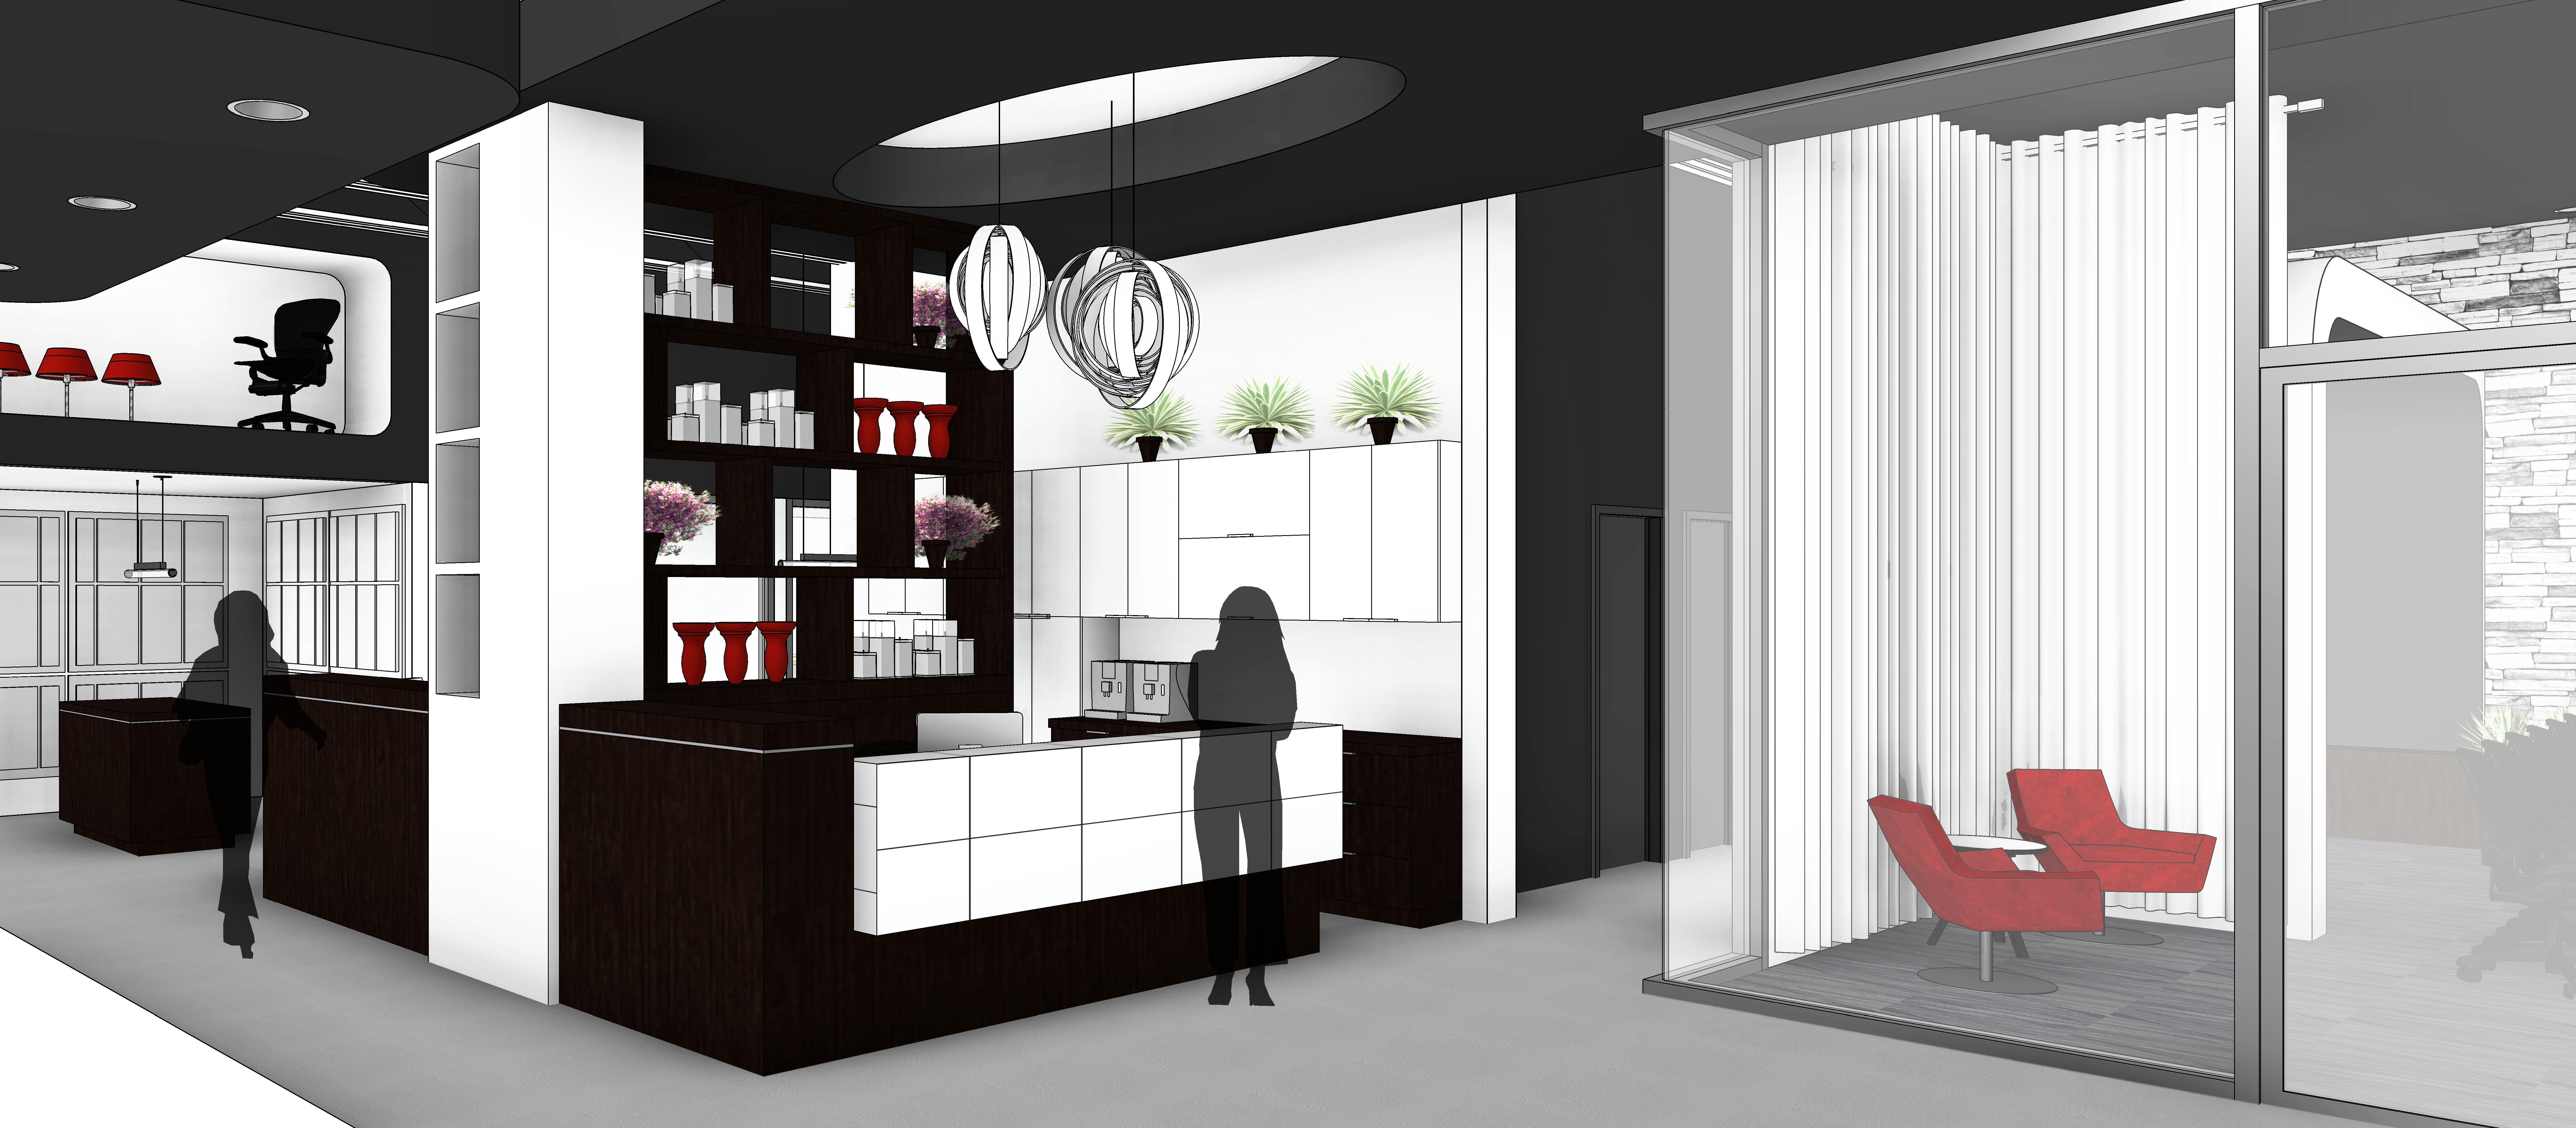 Boutique France Arcand // Illustration 19D couleur  Дизайн